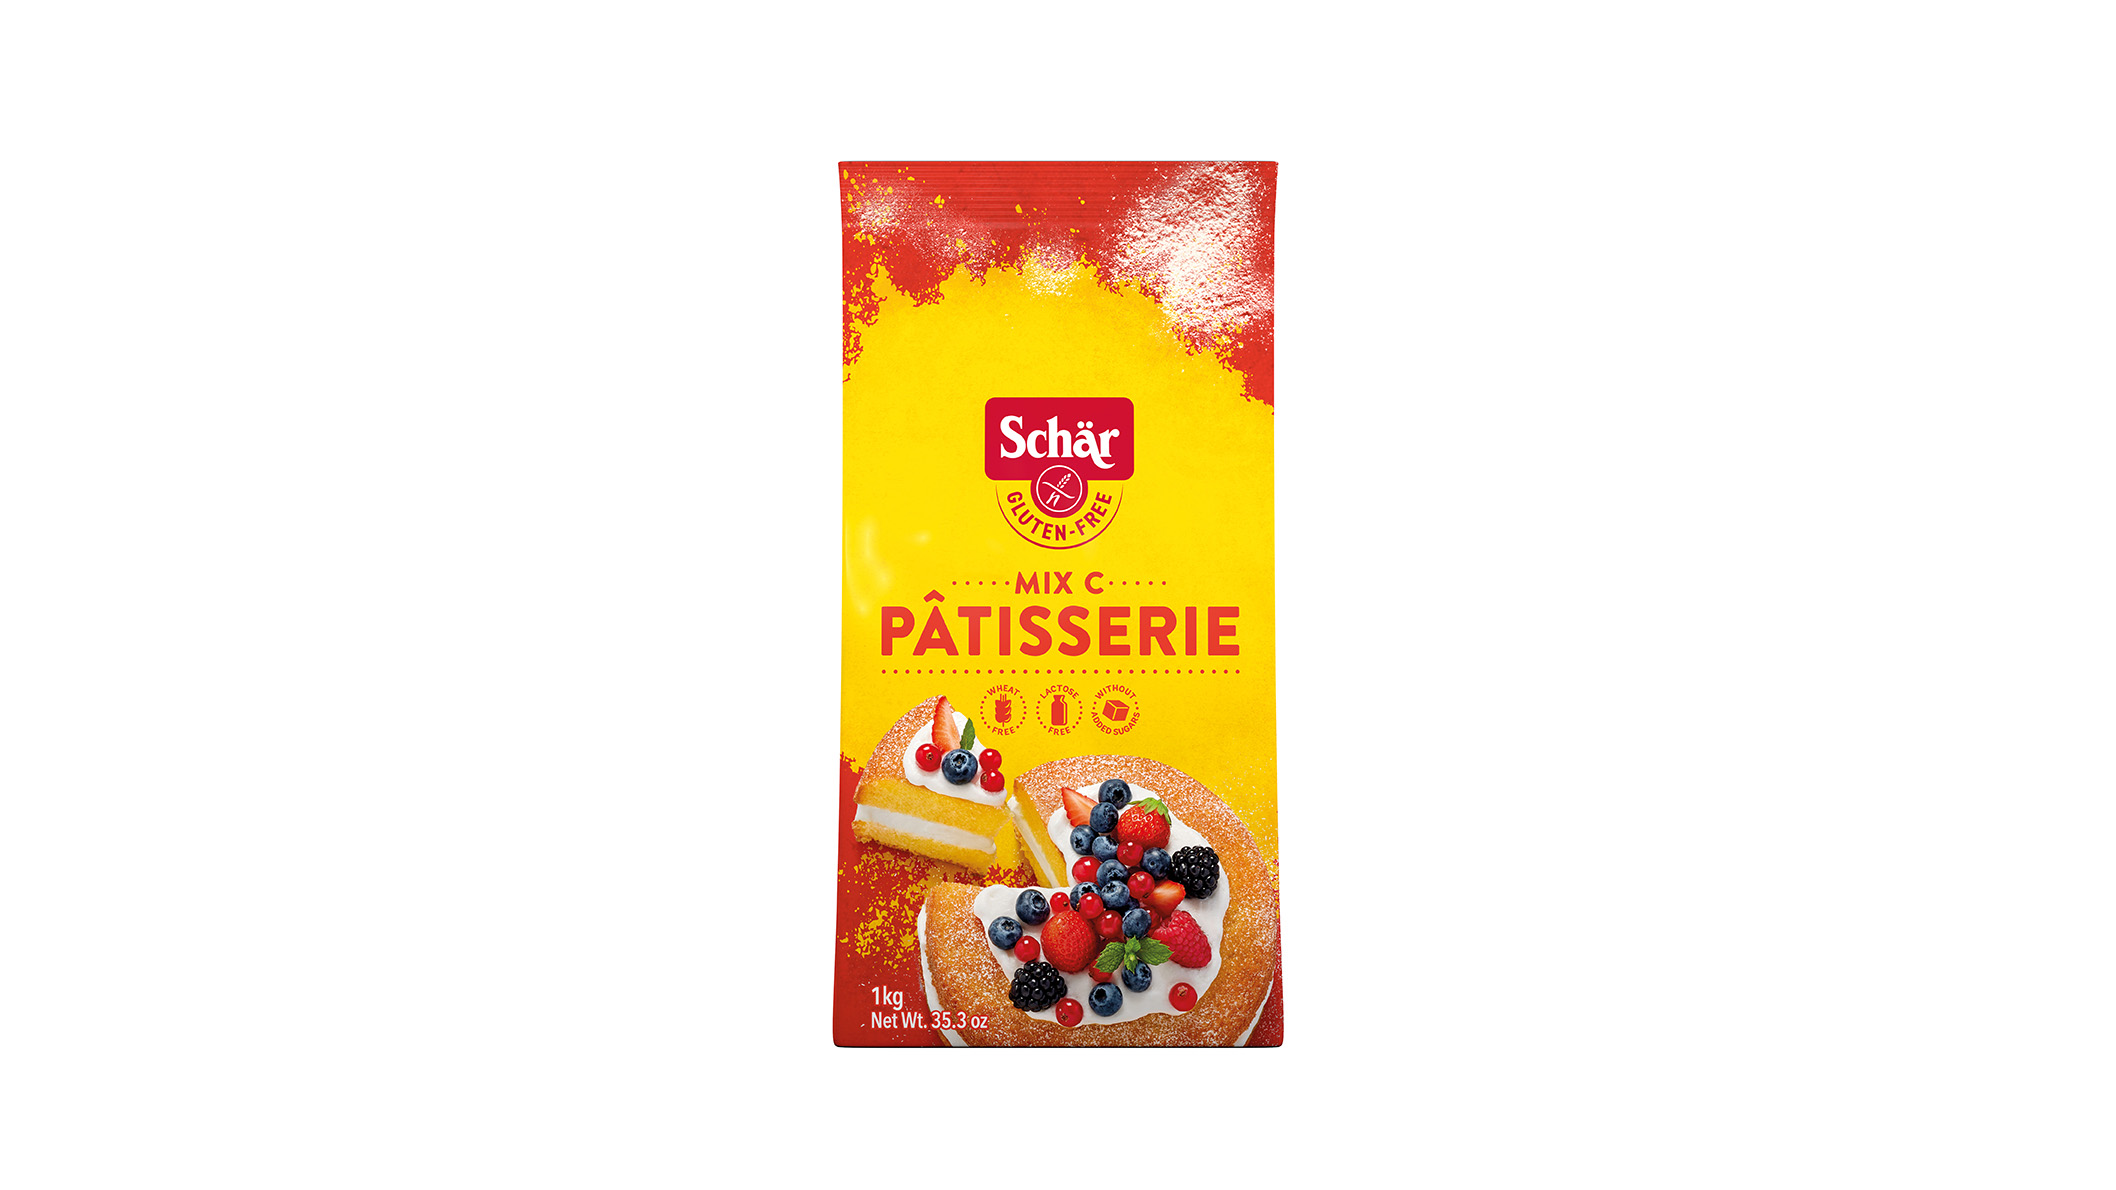 Bezglutensko brašno - Mix C - Mix Pâtisserie